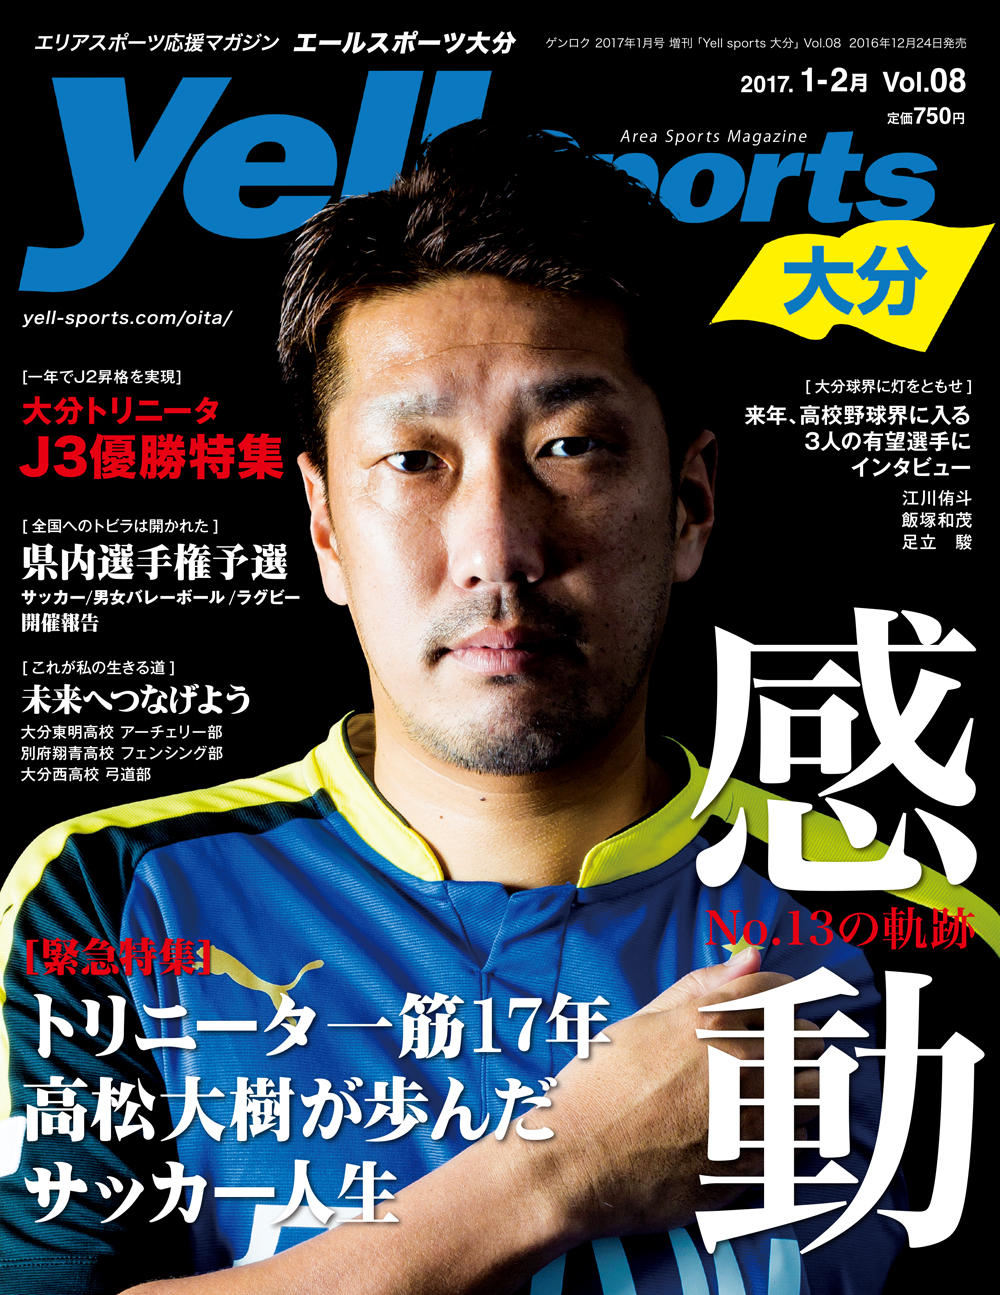 http://yell-sports.com/oita/article/2016/h1.jpg